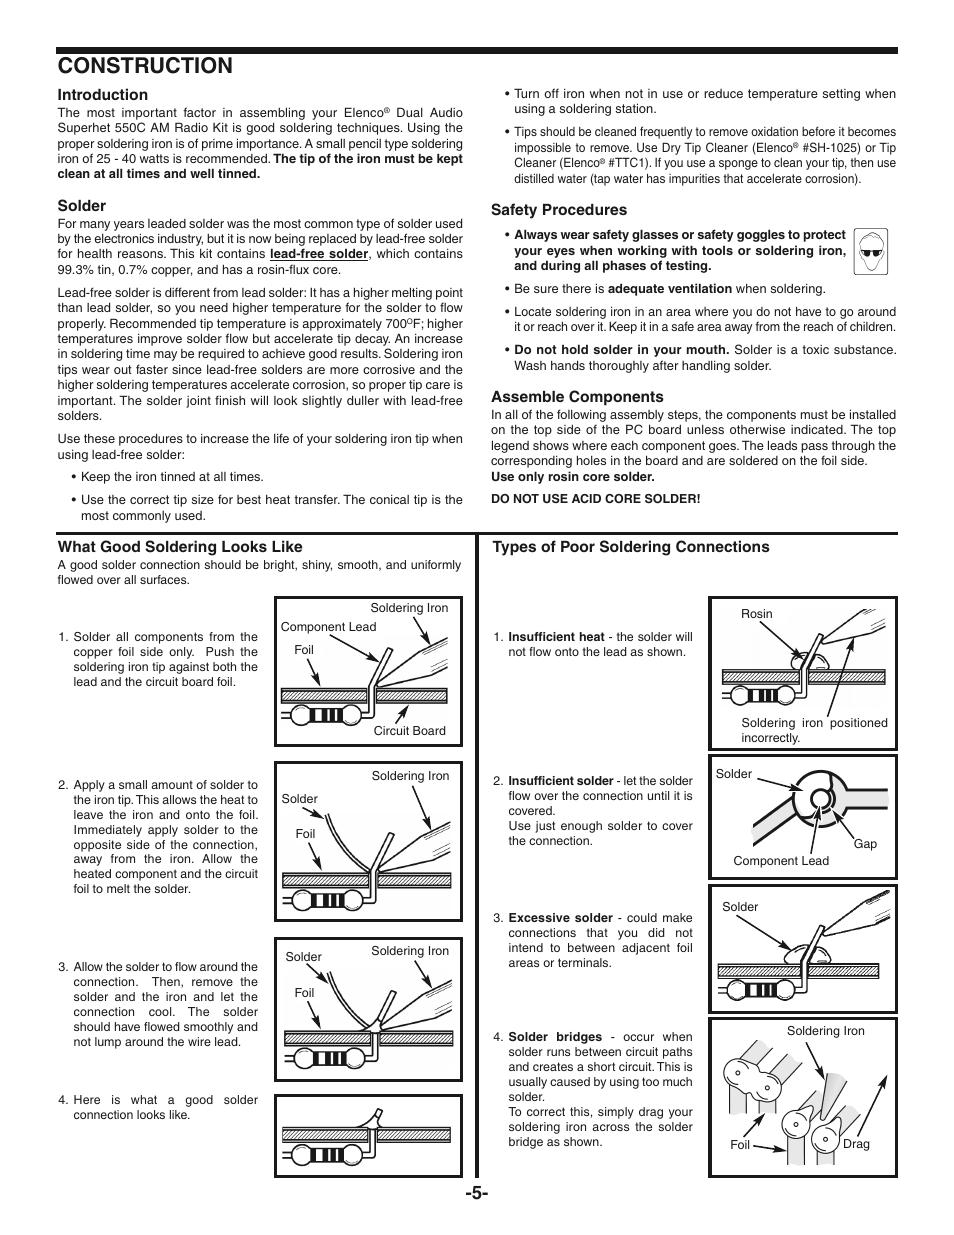 Construction | Elenco AM Radio Kit User Manual | Page 6 / 36